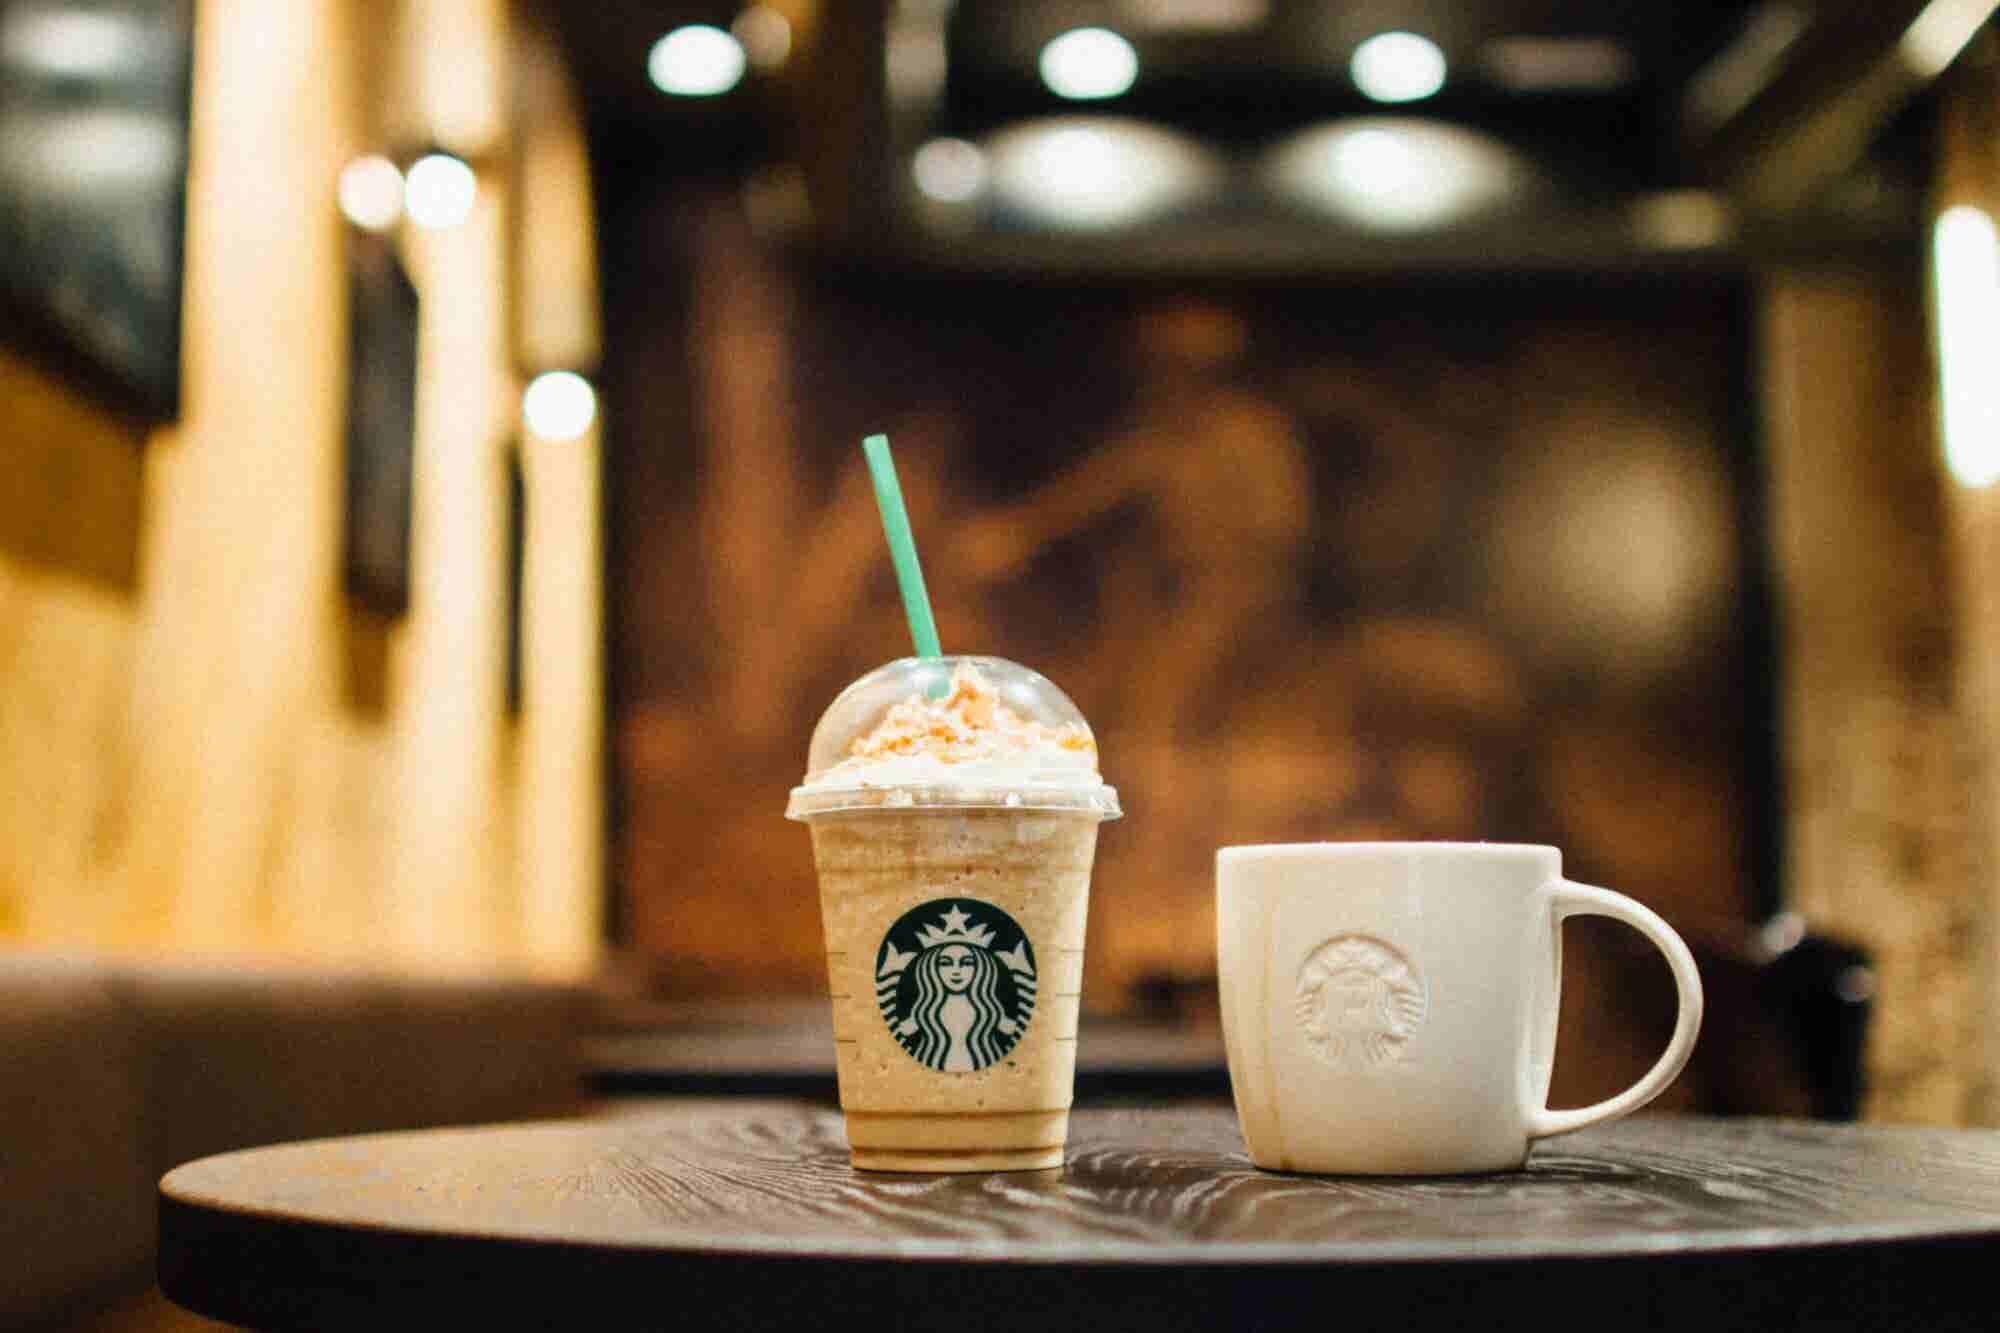 Starbucks to Block Public Wi-Fi Porn in 2019